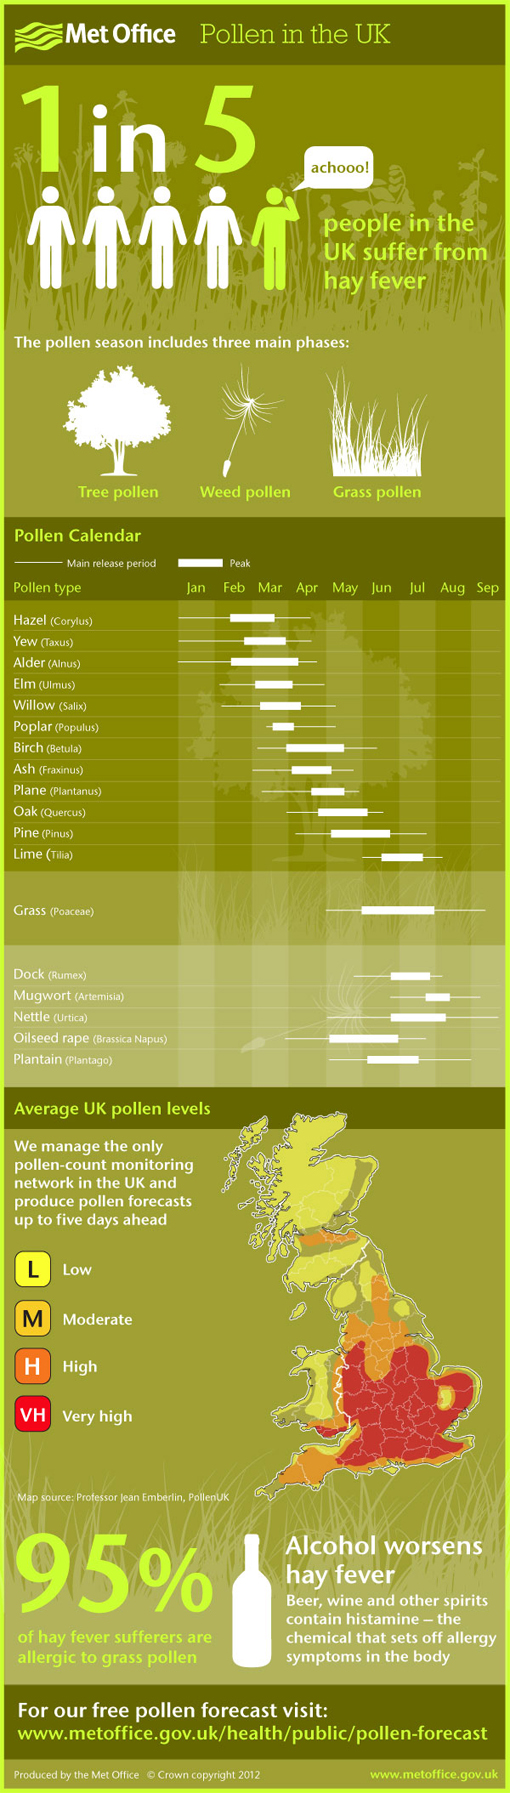 pollenforecast